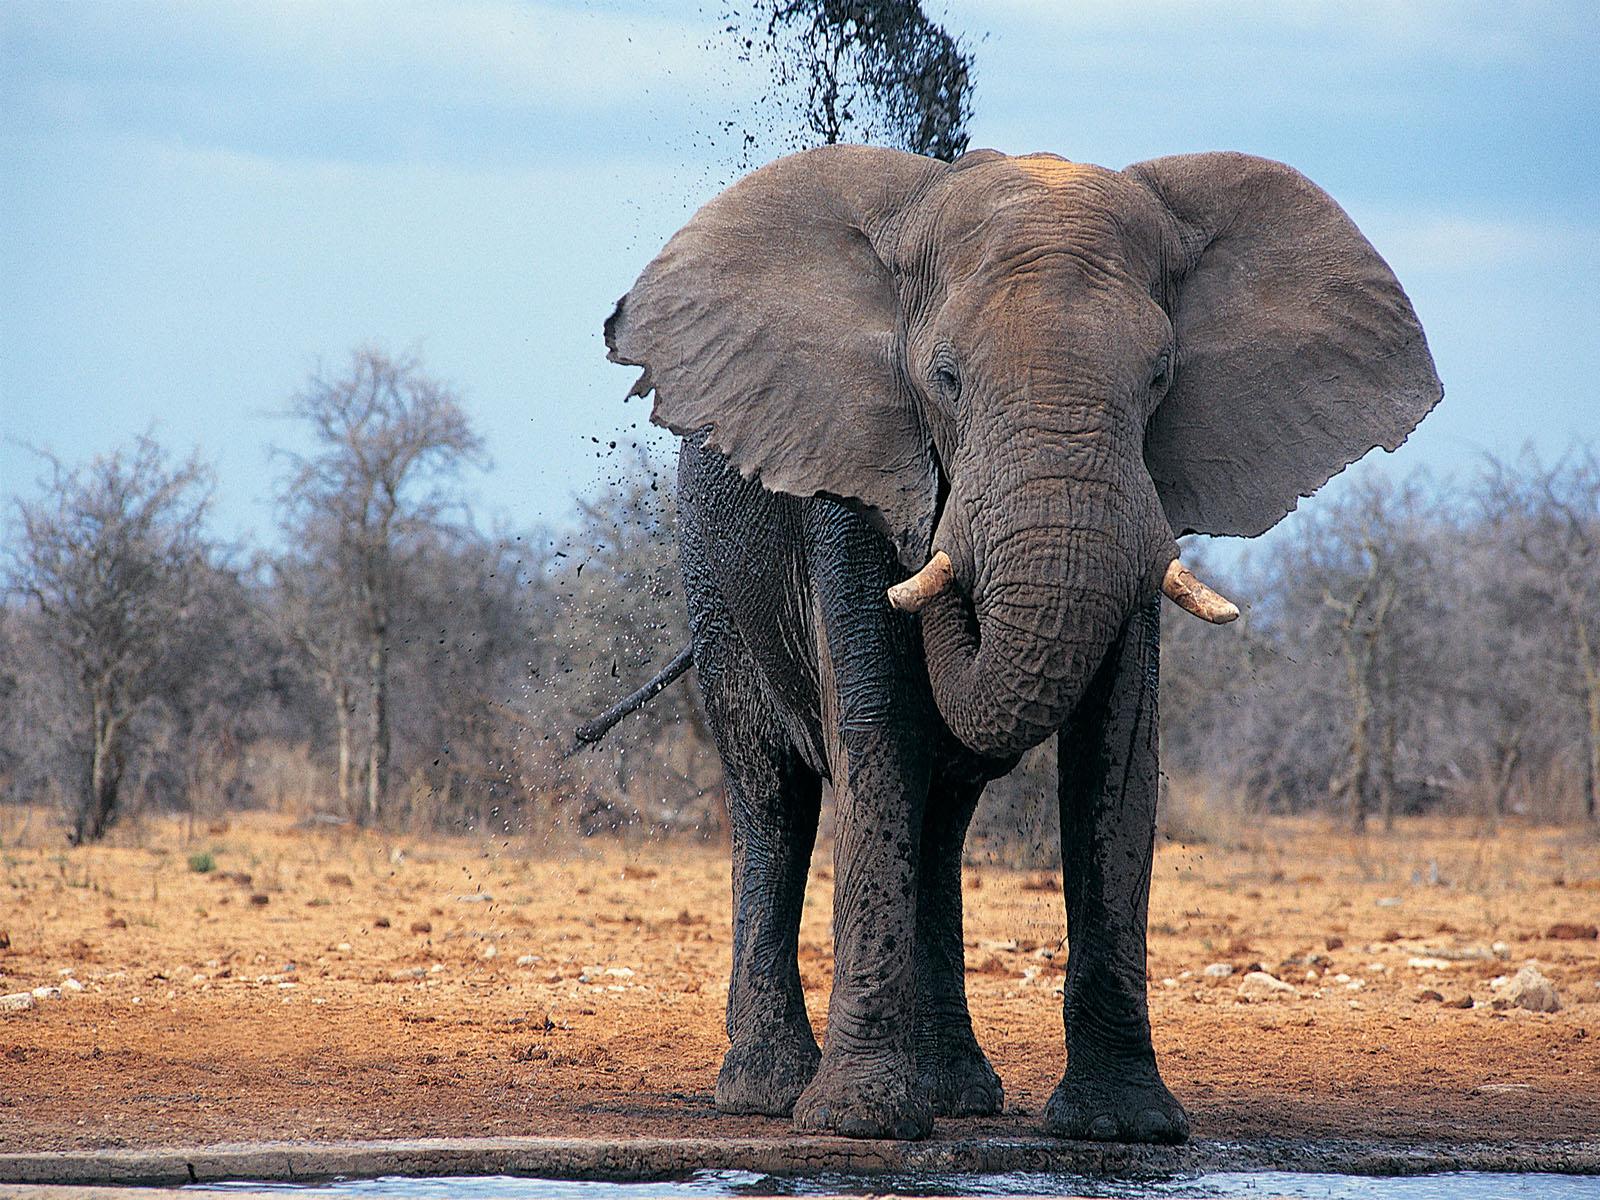 elephants wallpapers world - photo #1